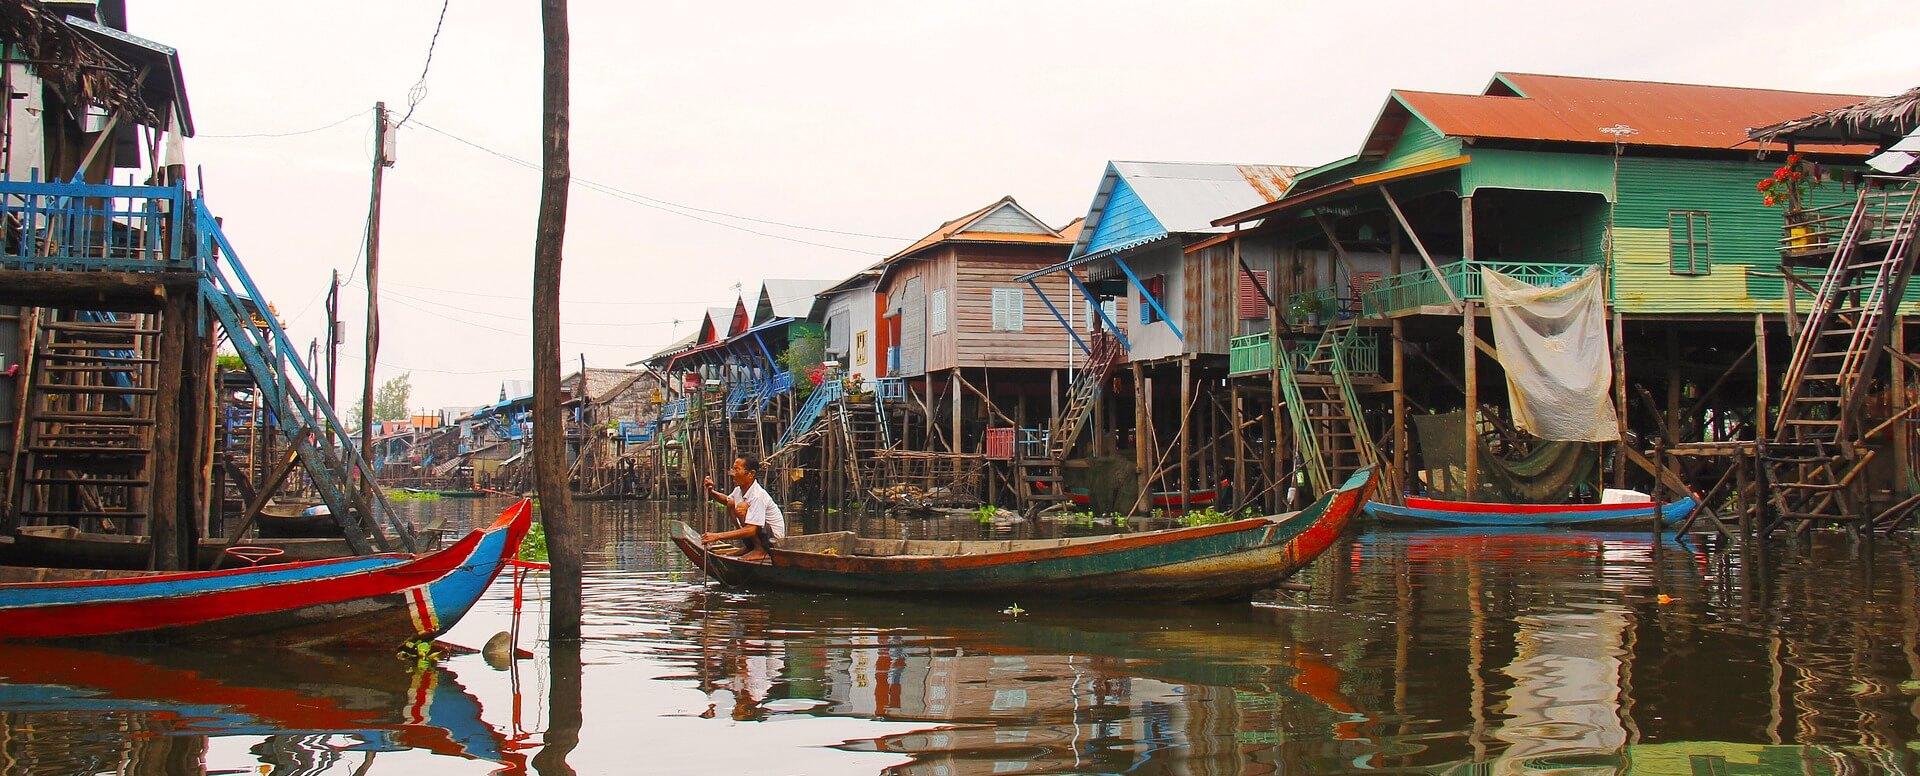 Cruise on the Lakes - Cambodia